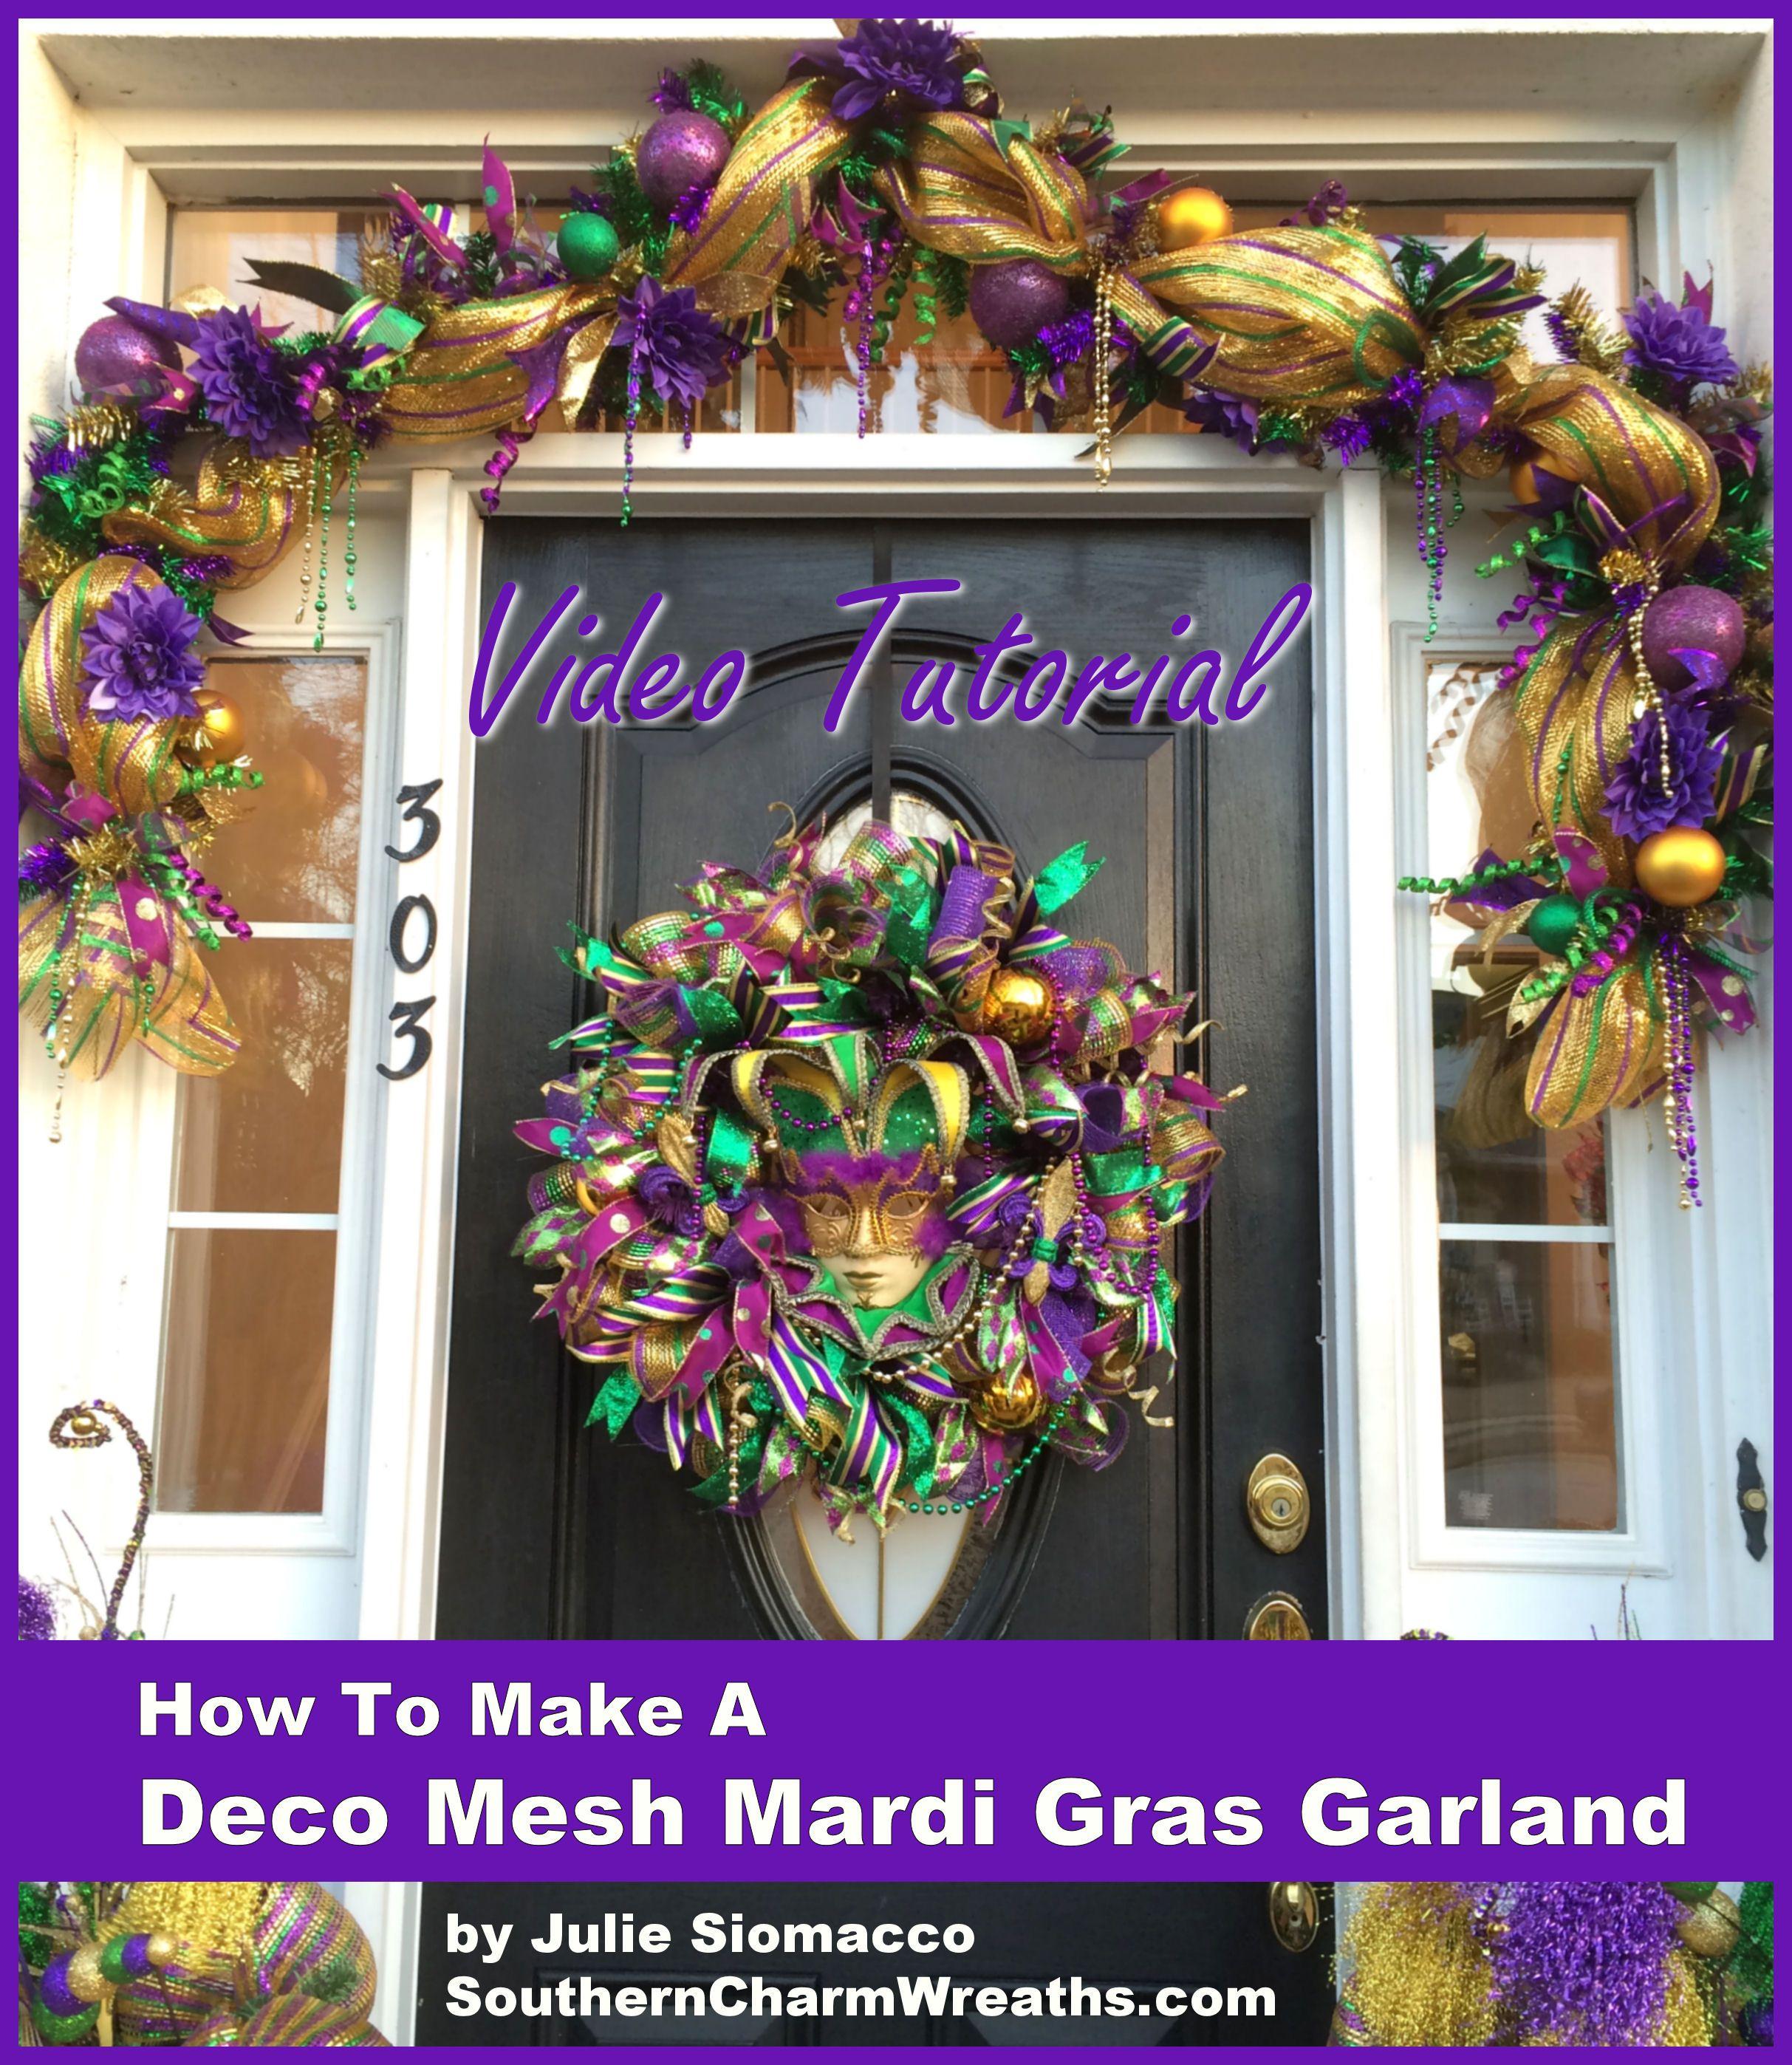 Diy Mardi Gras Garland Decorations With Deco Mesh, Ribbon, Ornaments,